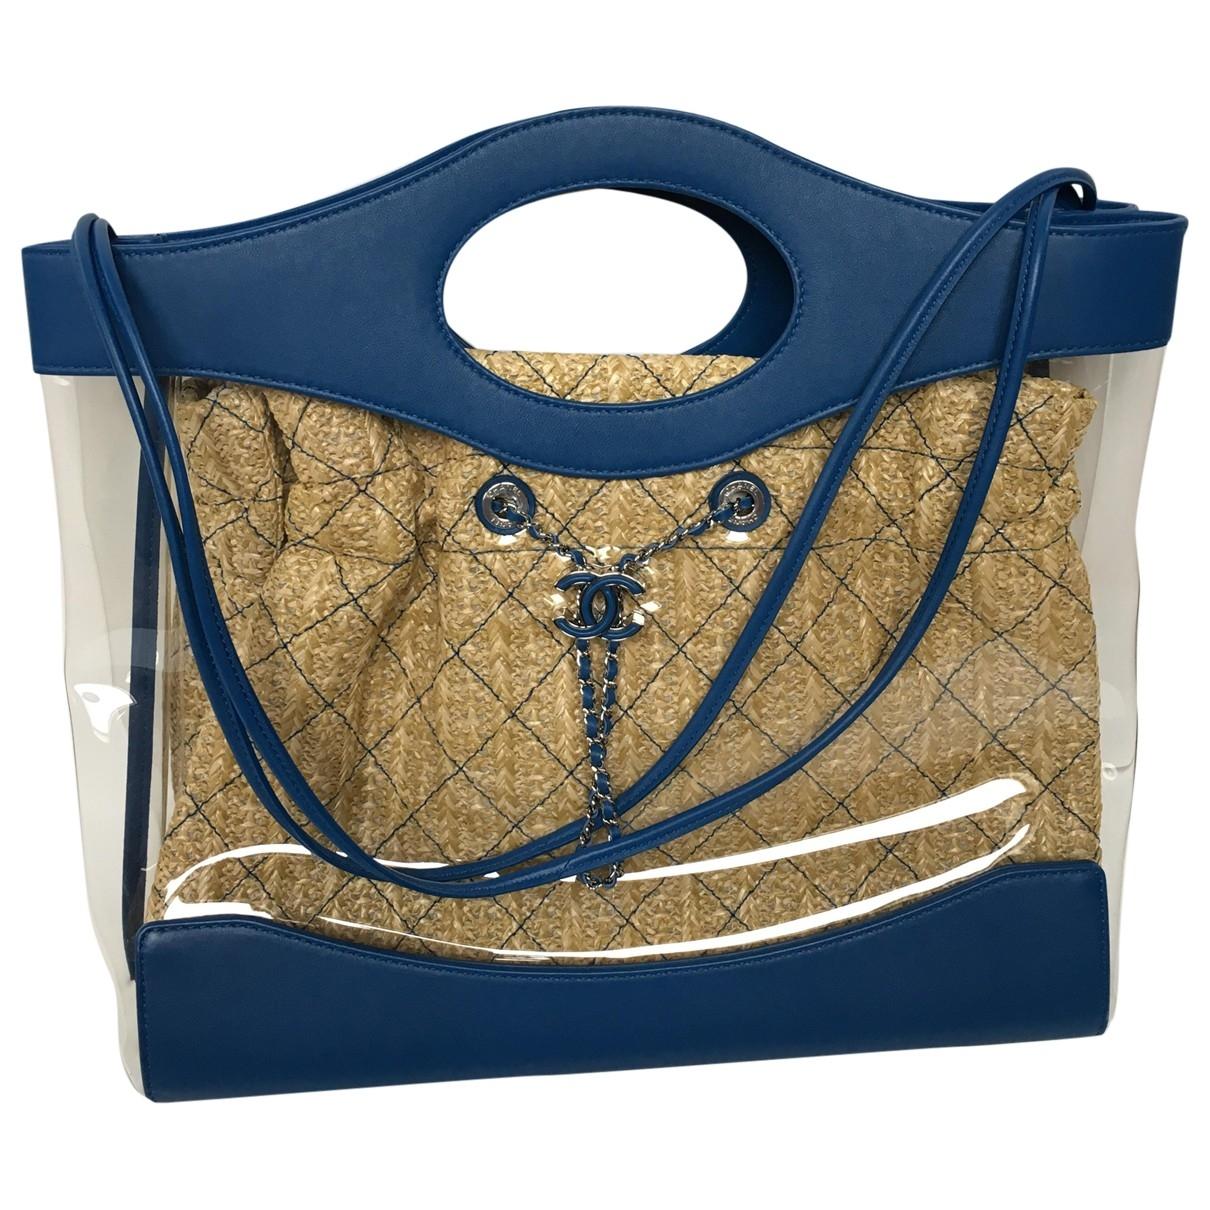 Chanel 31 Blue Leather handbag for Women \N